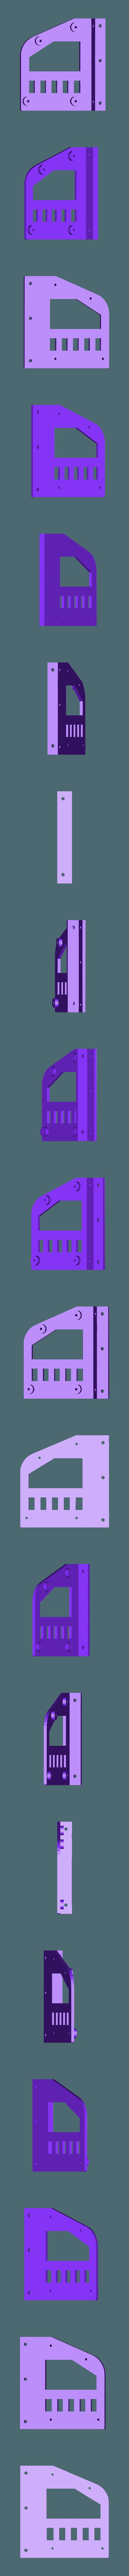 Soporte_para_AM8_Perfil_aluminio_2040.stl Télécharger fichier STL gratuit Caja placa Zonestar ZRIB para Anet A8 / AM8 (Extrusor Dual multicolor) • Design pour impression 3D, celtarra12